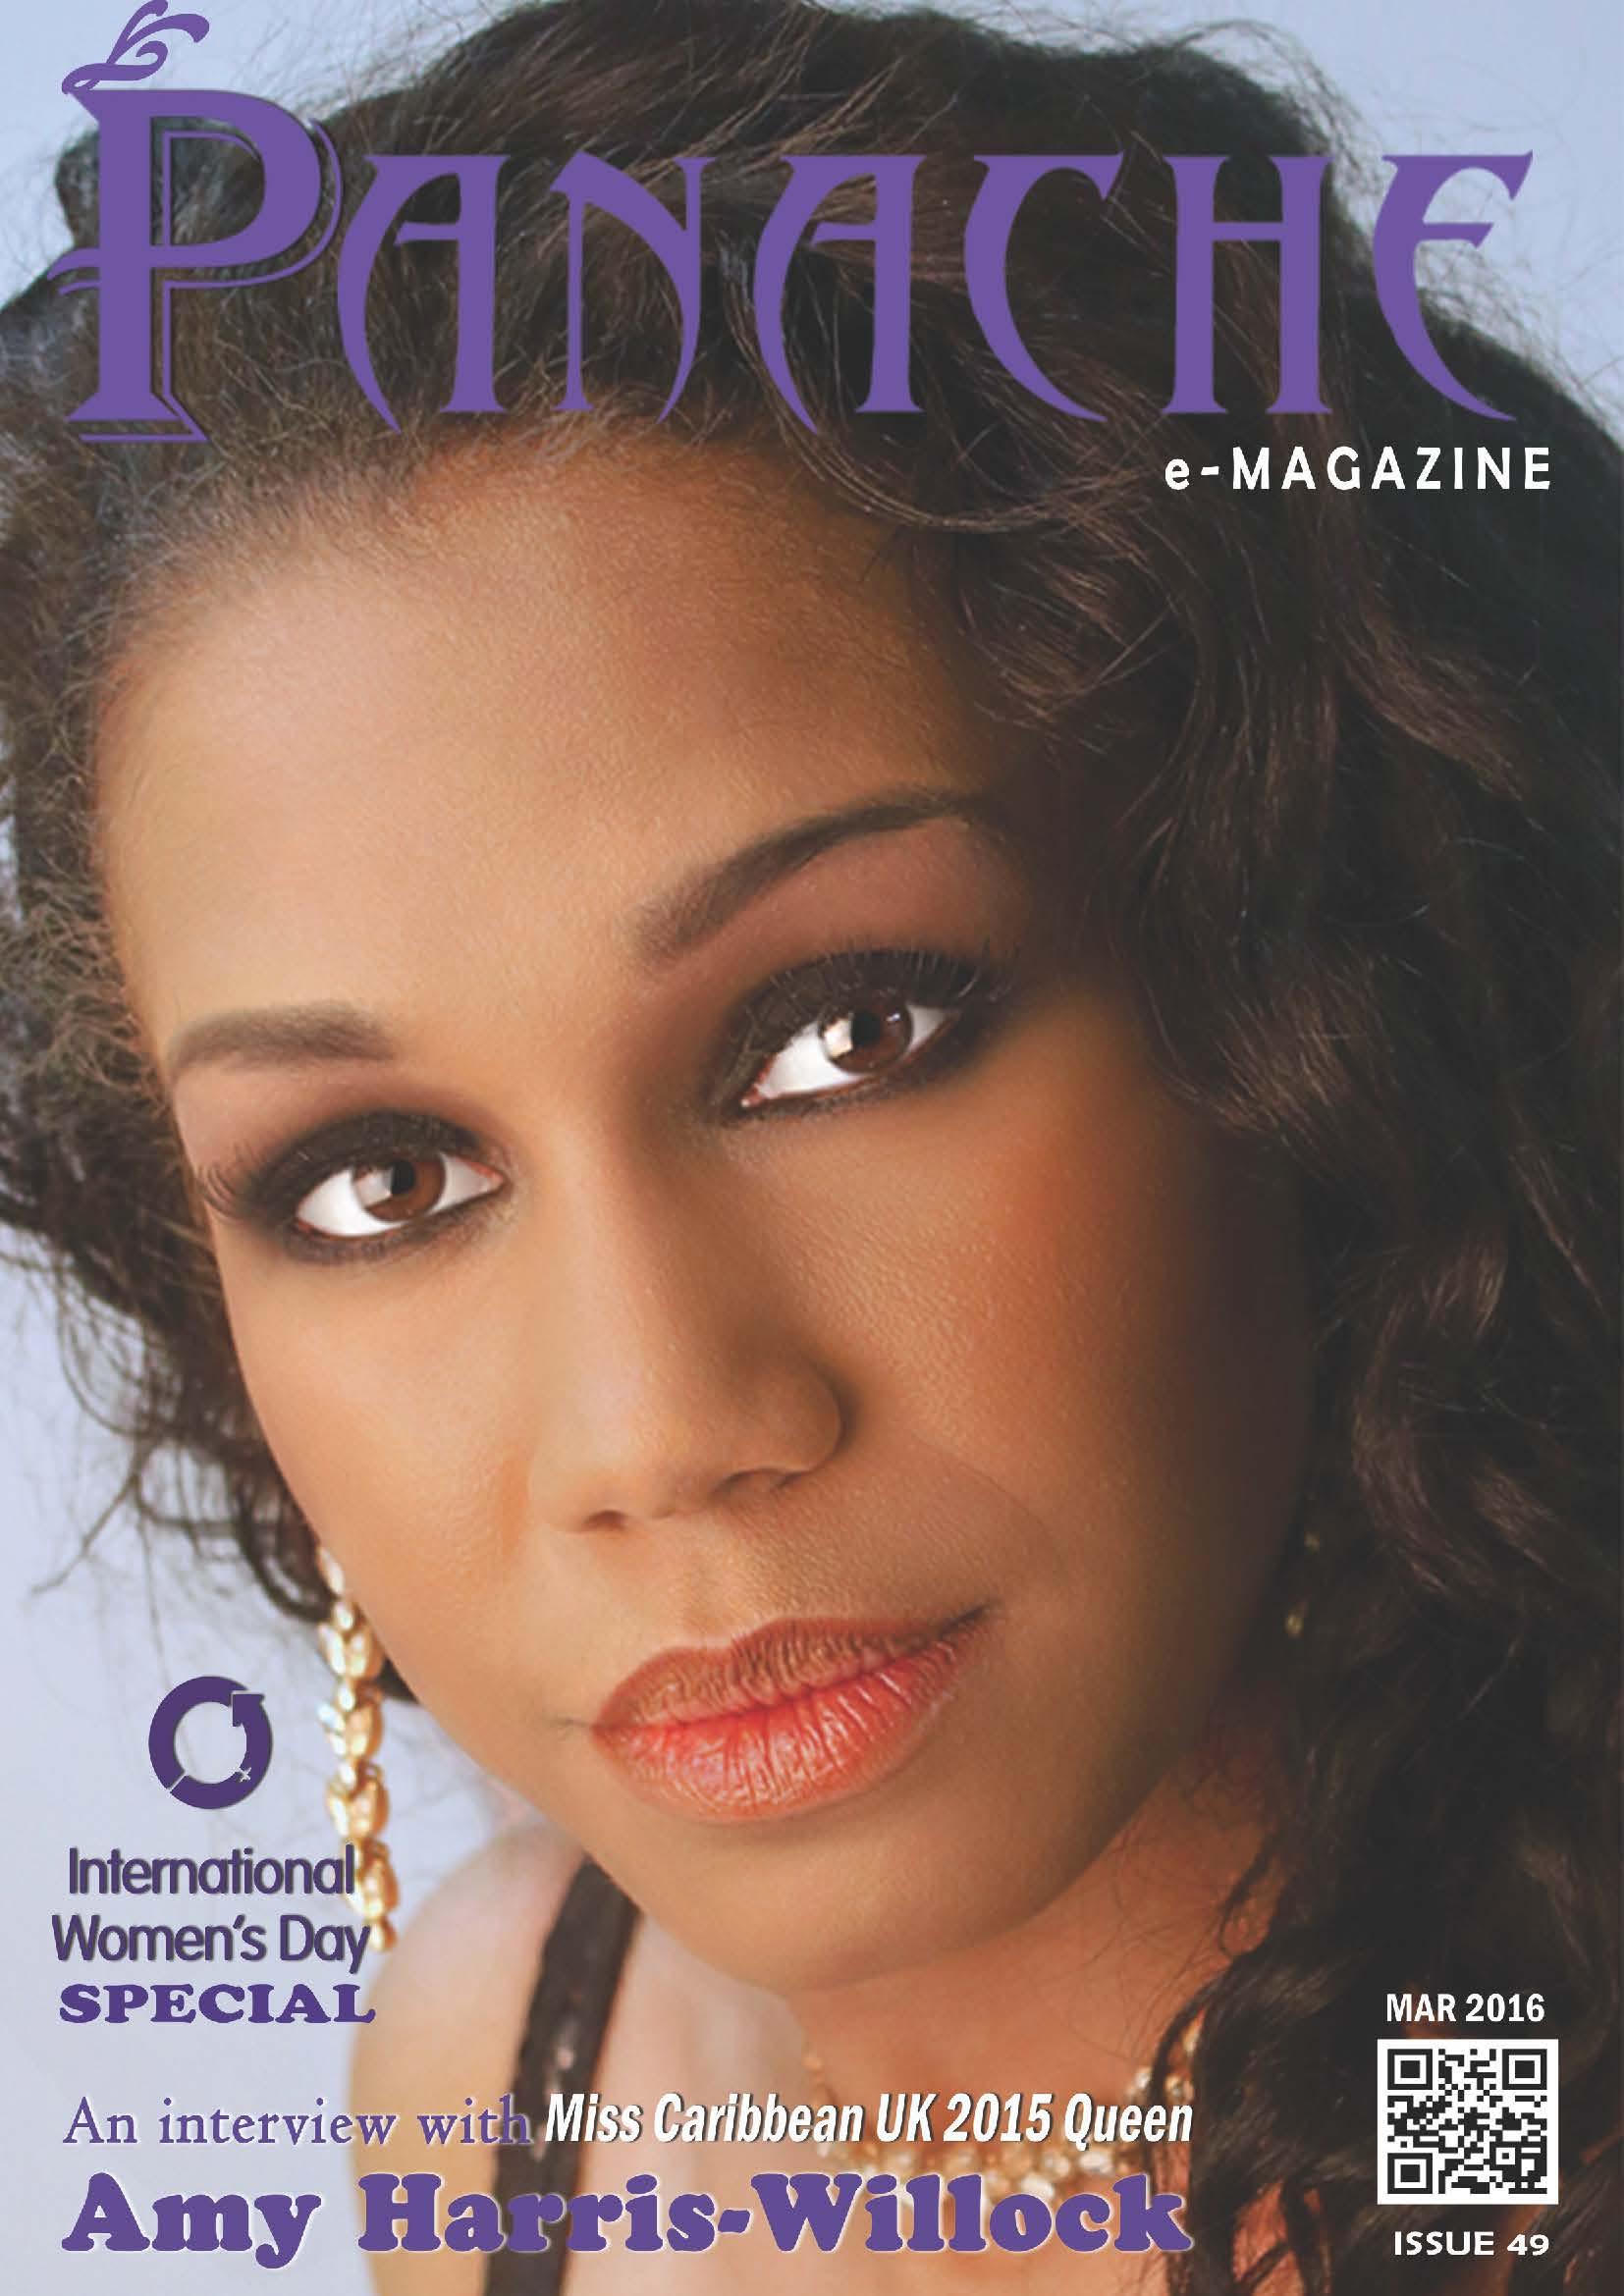 PANACHE - E-MAGAZINE - issue 49-dps_Page_01